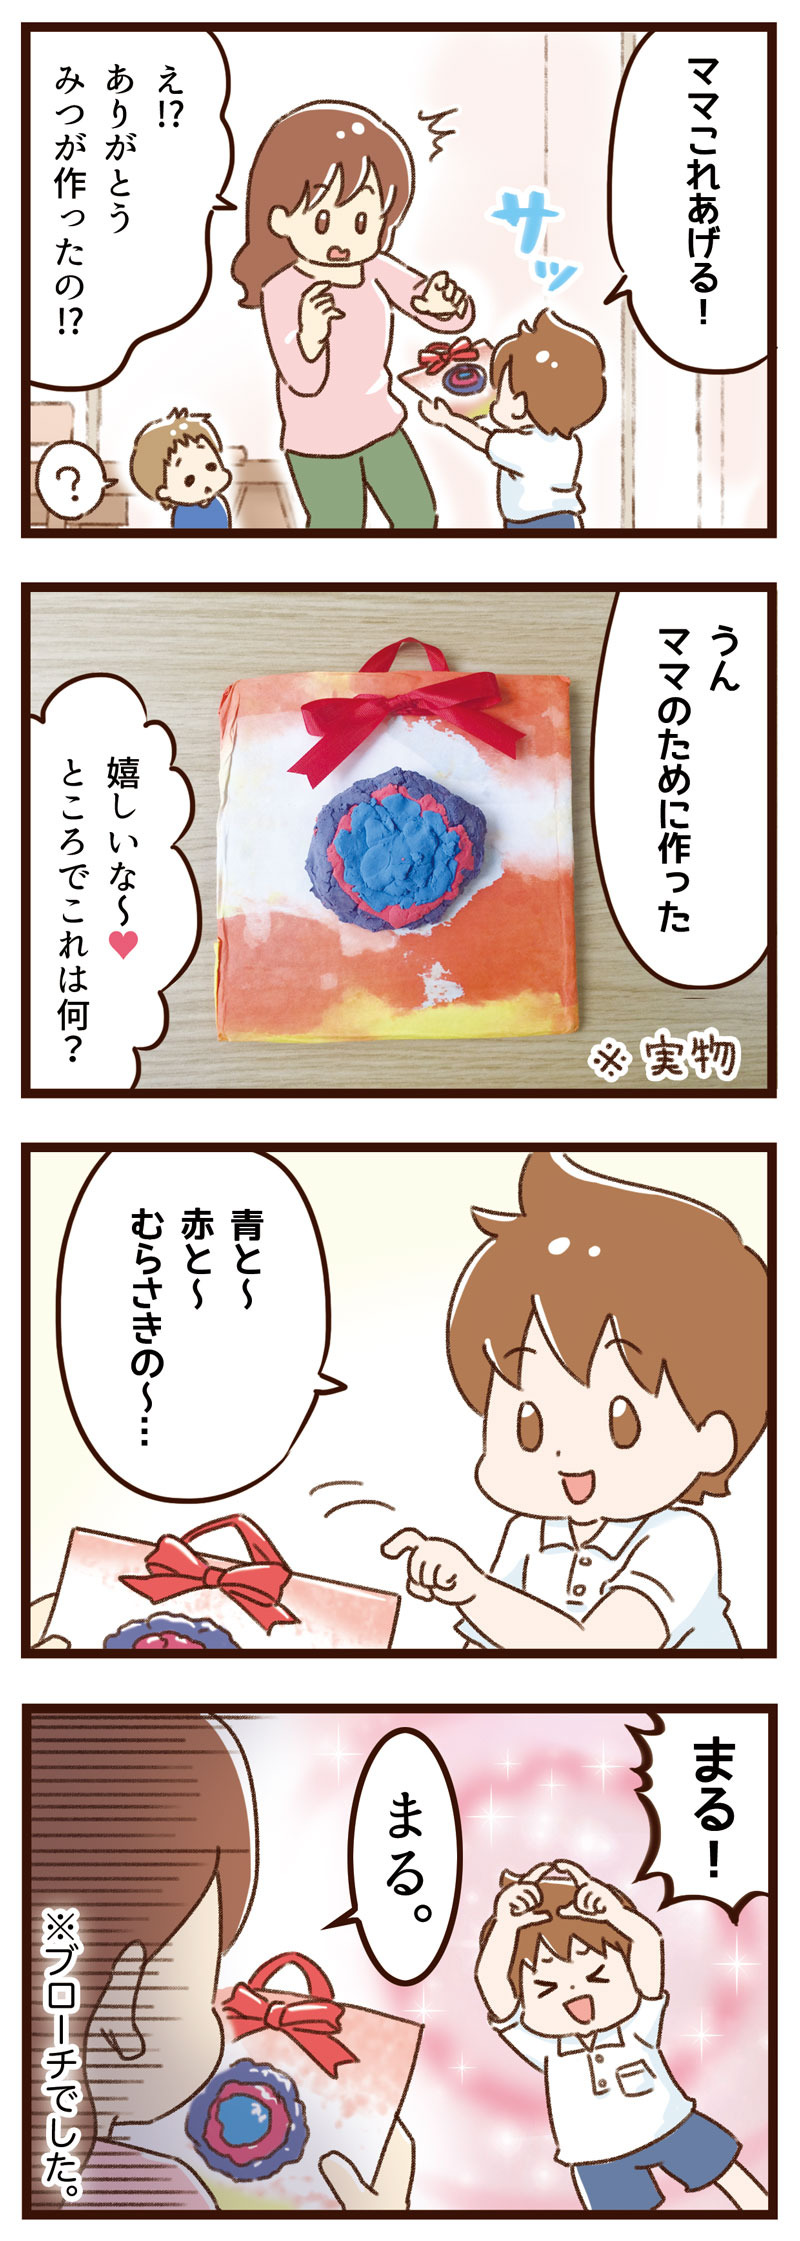 yumui288-1